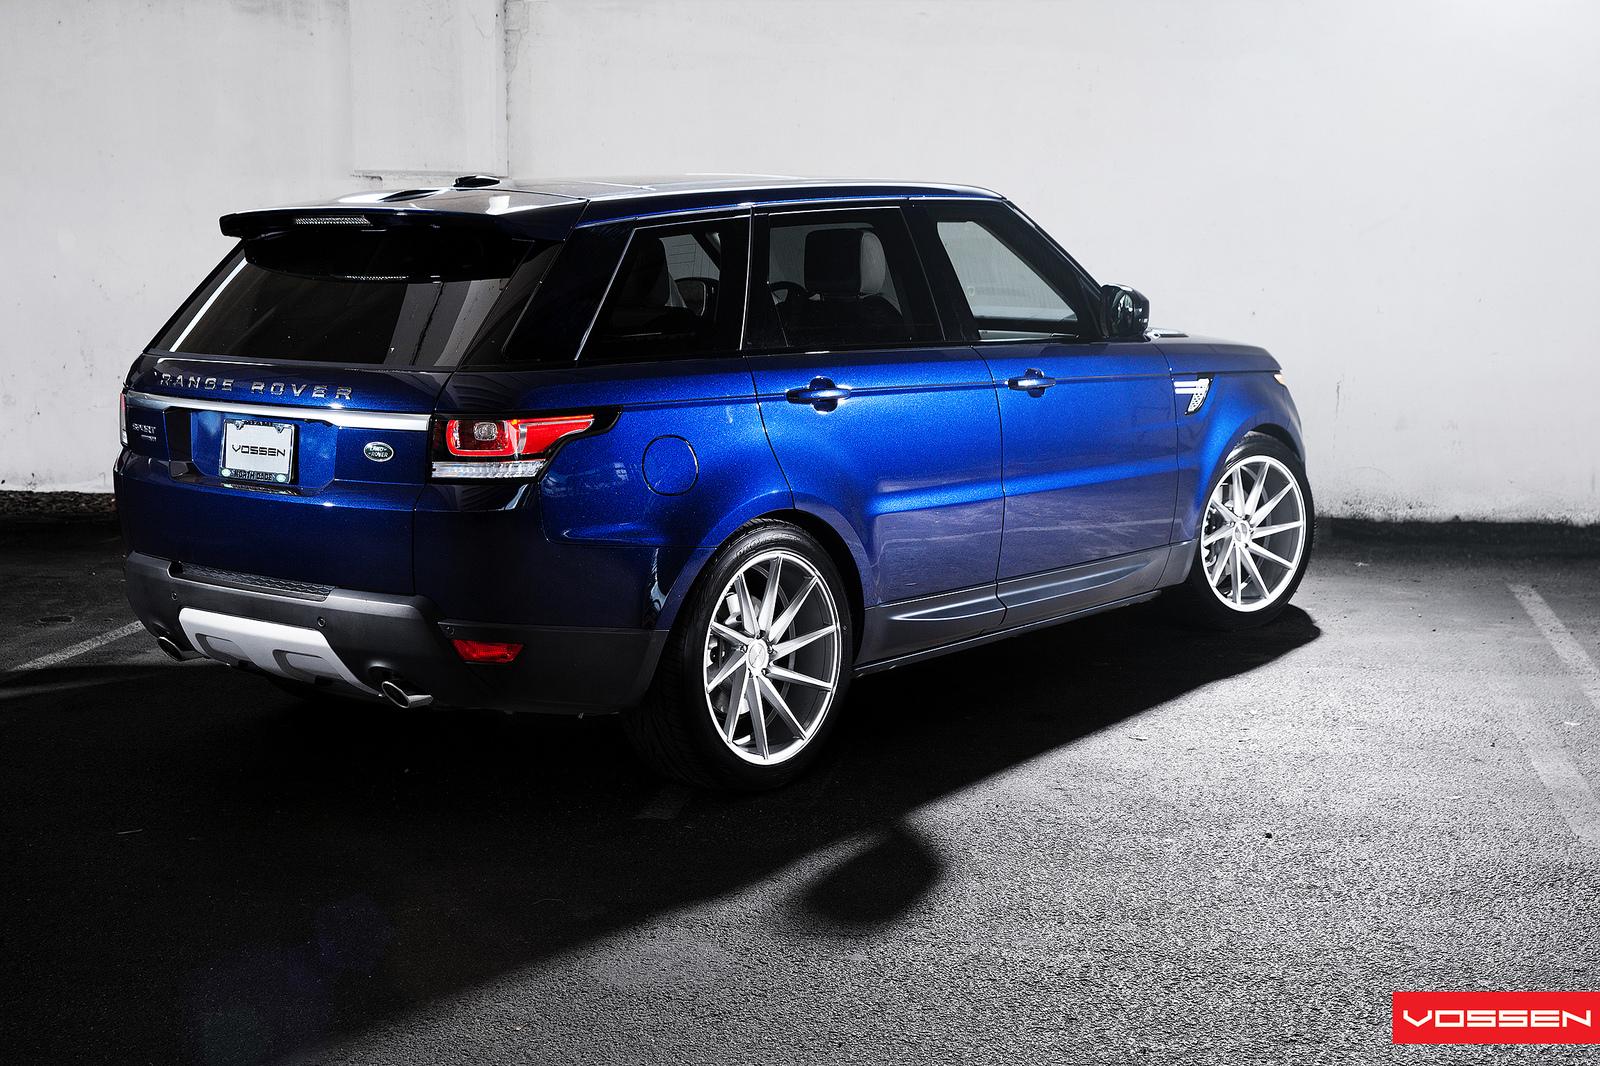 http://s1.cdn.autoevolution.com/images/news/gallery/2014-range-rover-sport-gets-22-inch-vossen-cvt-wheels-video-photo-gallery_8.jpg?1385198190